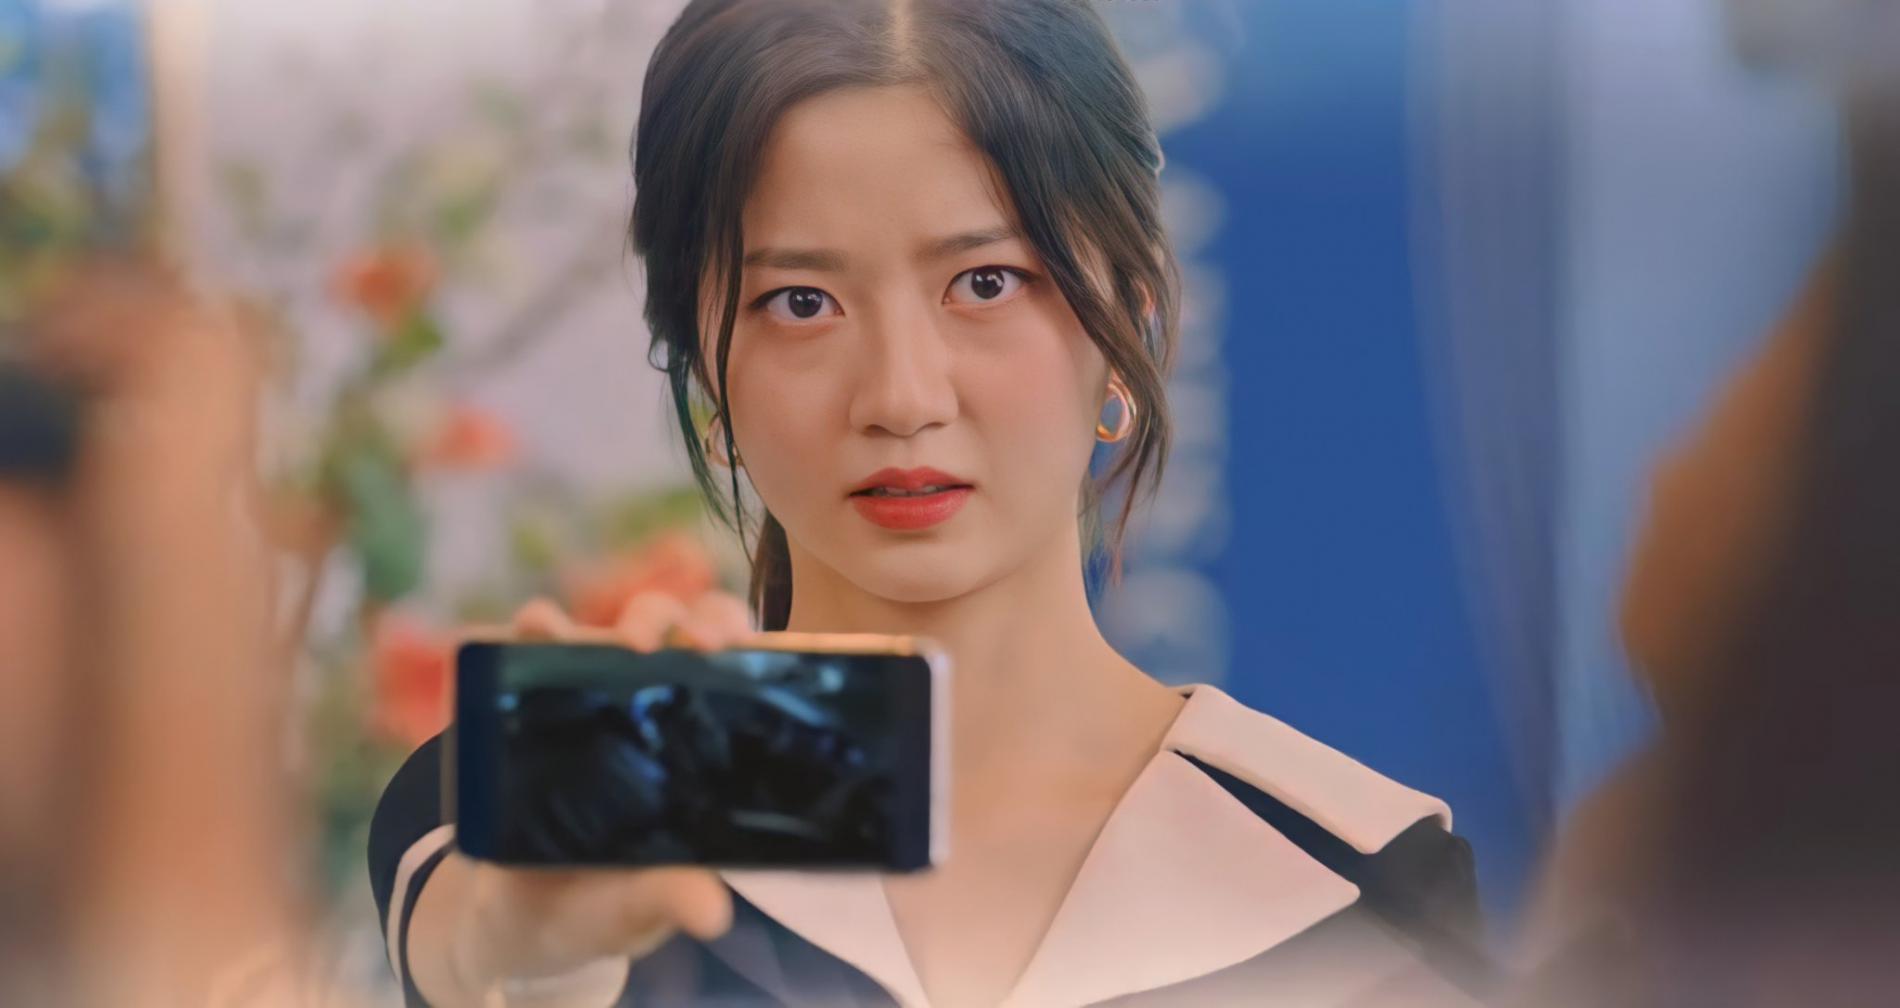 Link Streaming Drama Korea Penthouse 3 Episode 10 Sub Indo, Kemarahan Bae Rona Kebangkitan Oh Yoon He